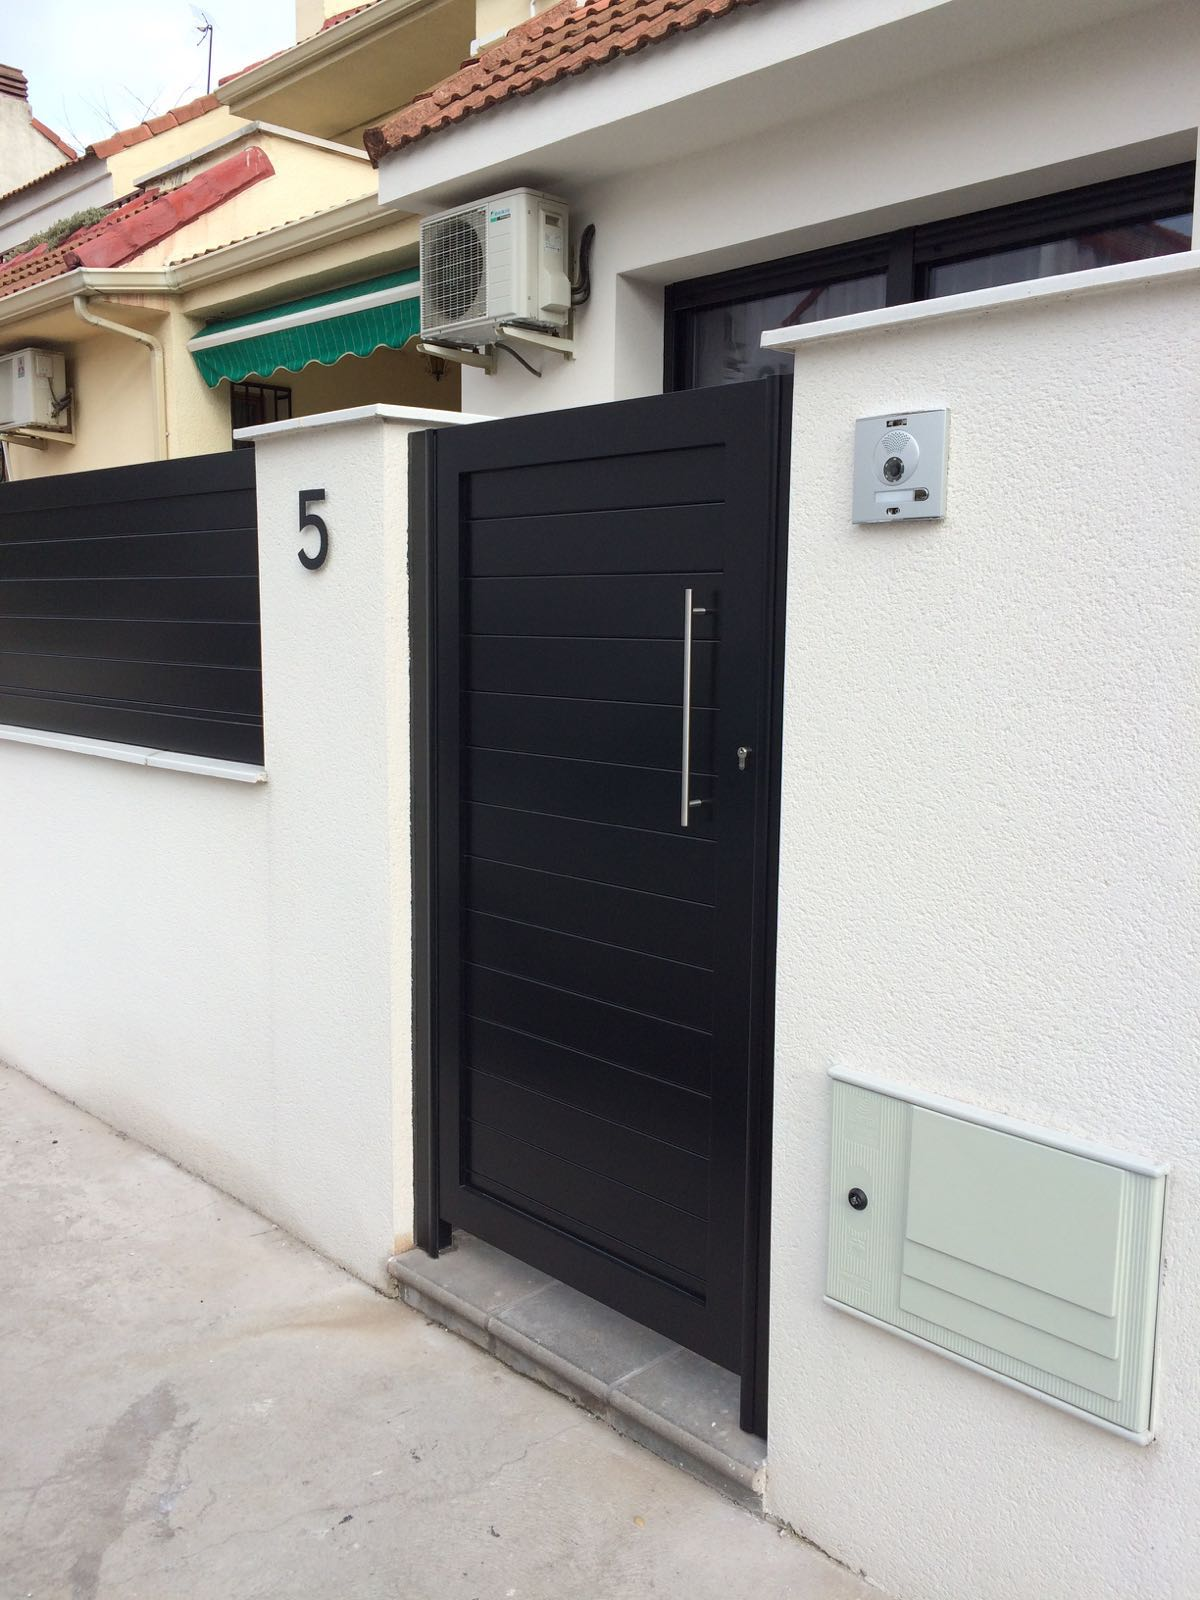 Modelos puertas de aluminio para exterior free modelos de for Puertas de aluminio exterior precios